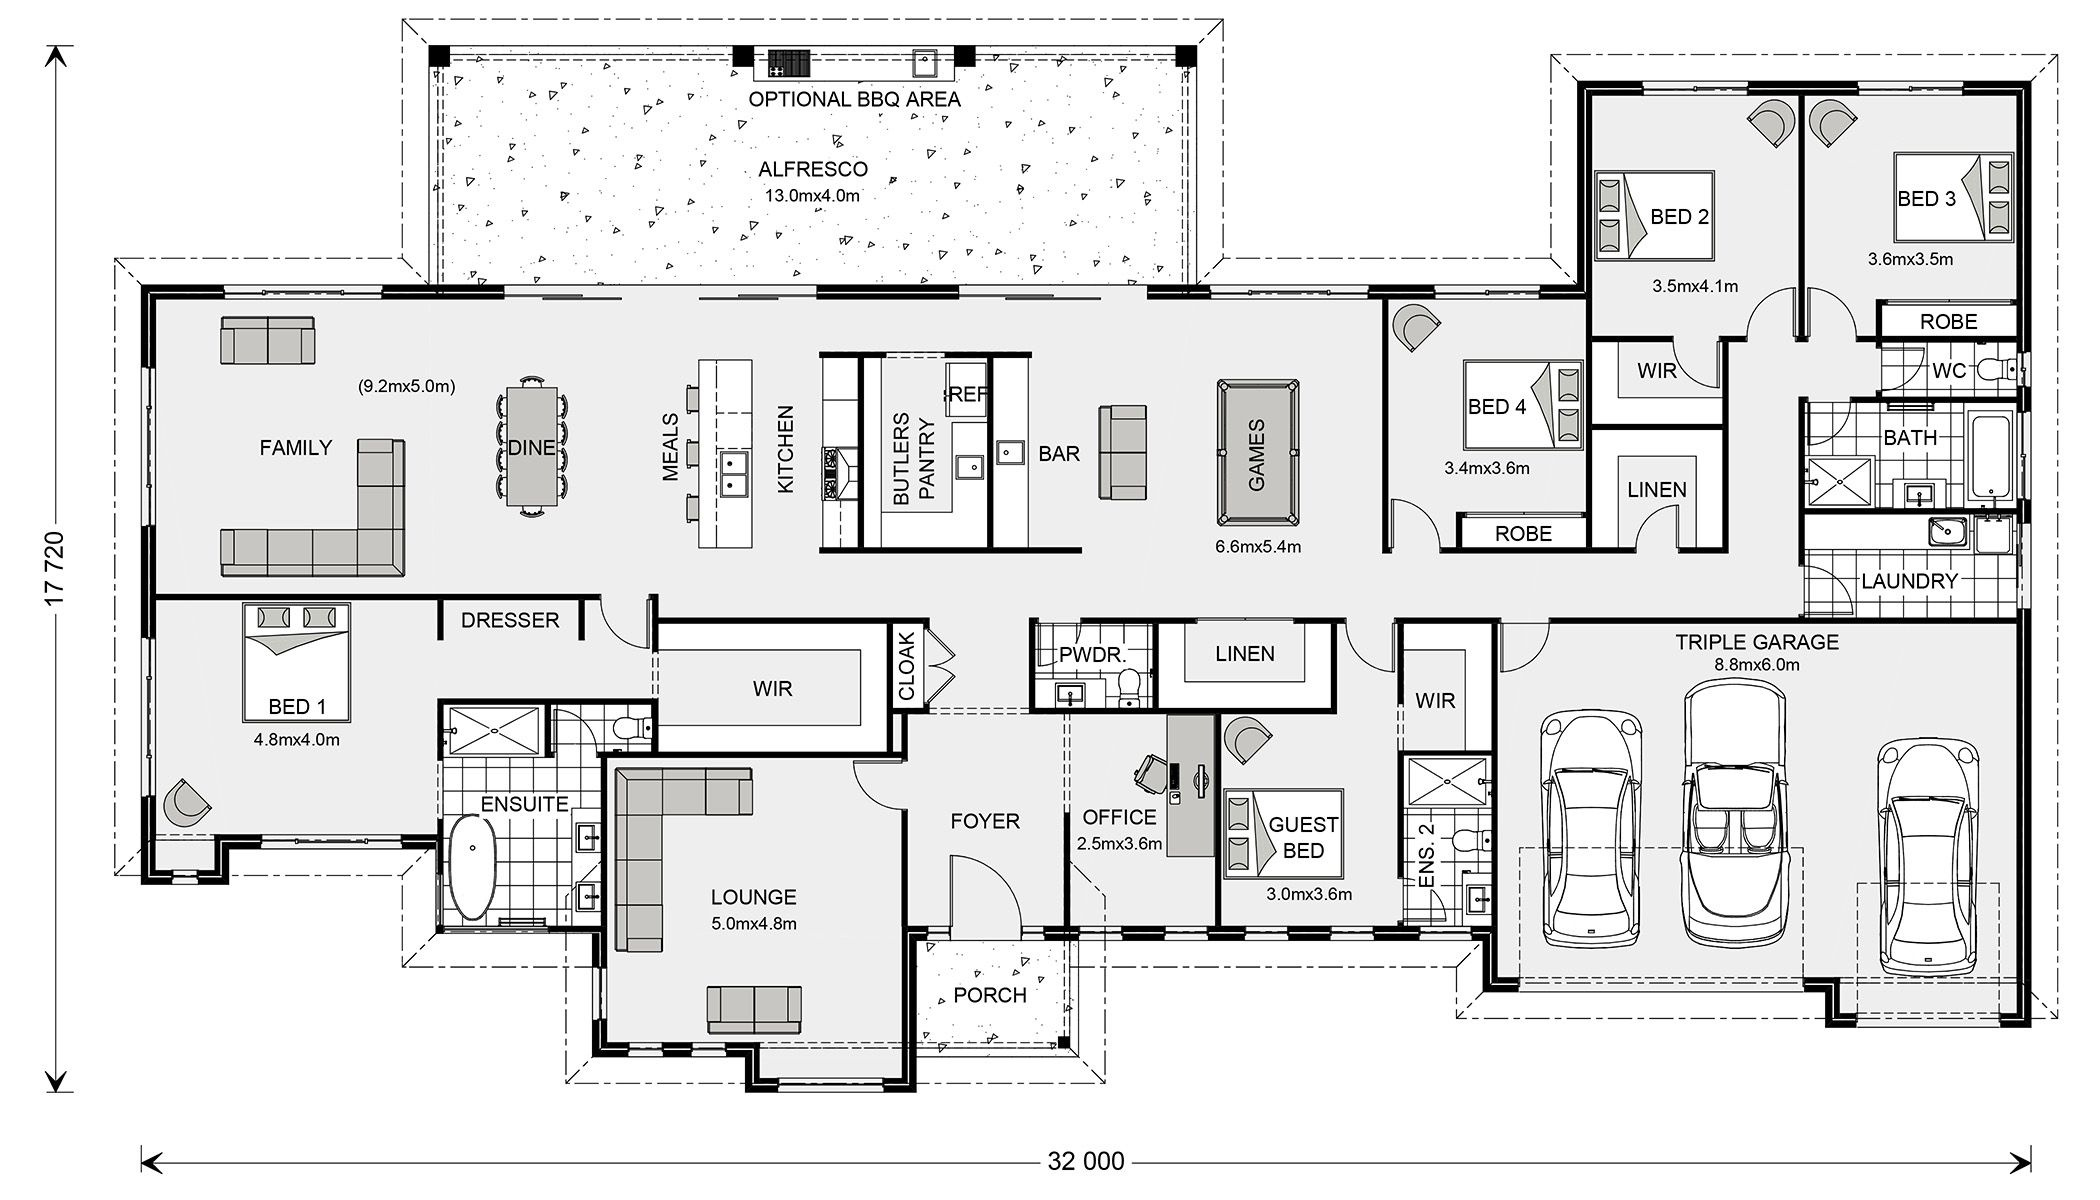 Floor Plan | SINGLE STORY HOUSE PLANS | Pinterest | Melbourne, House ...